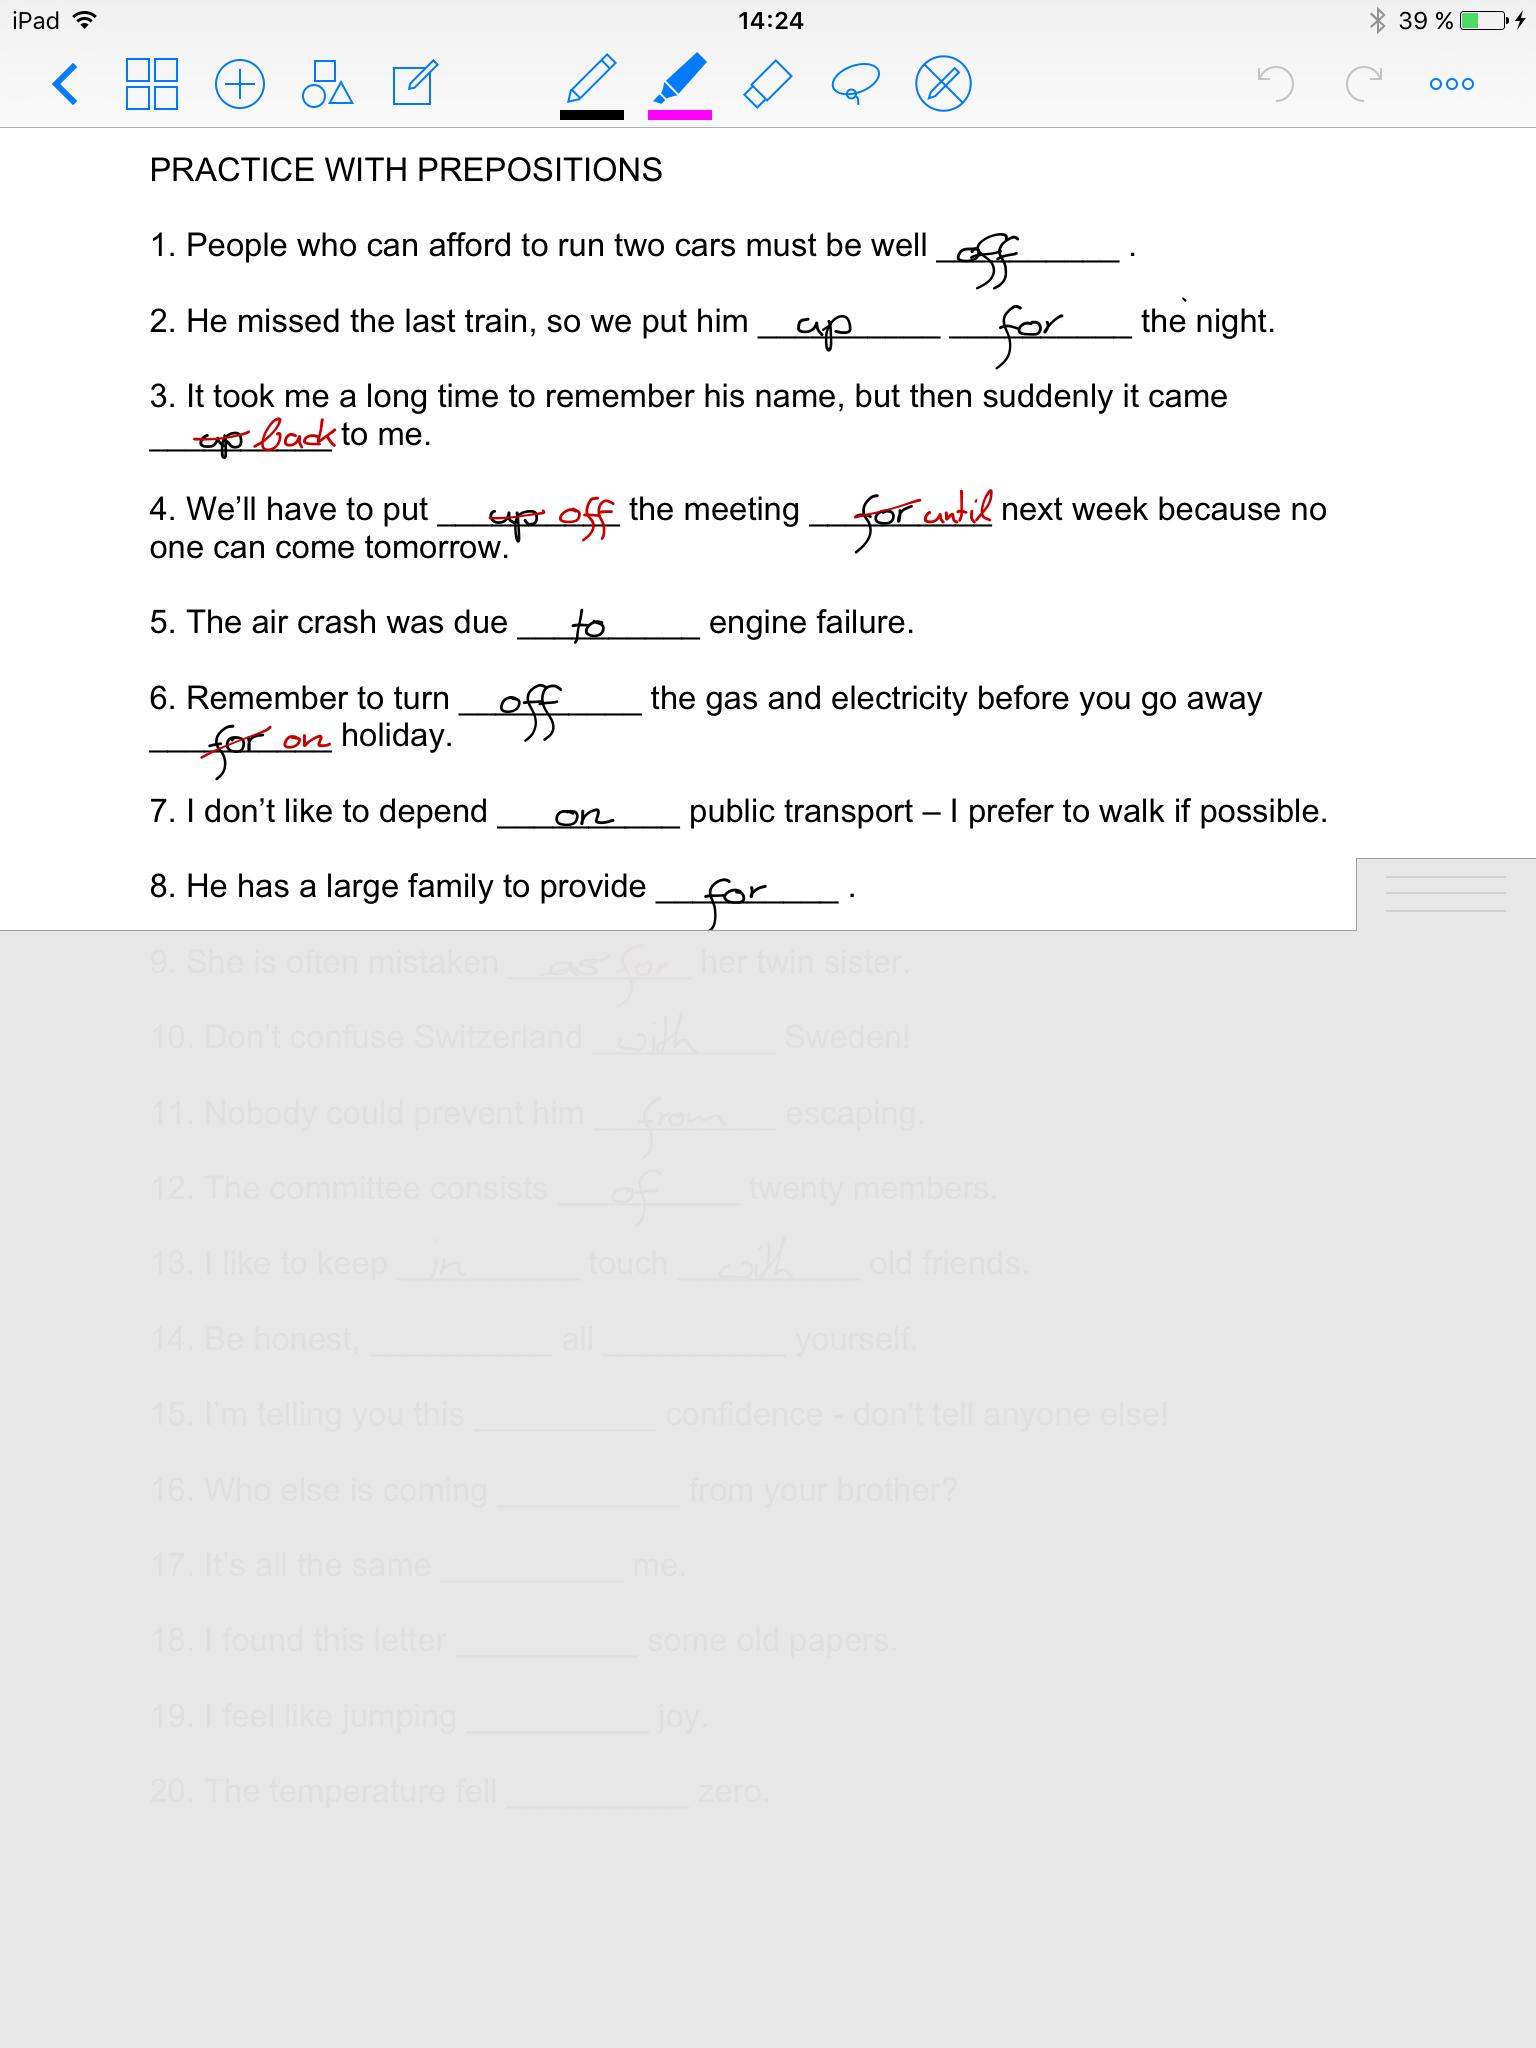 Handschriftliche Notizen | Projektblog papierloses Studium